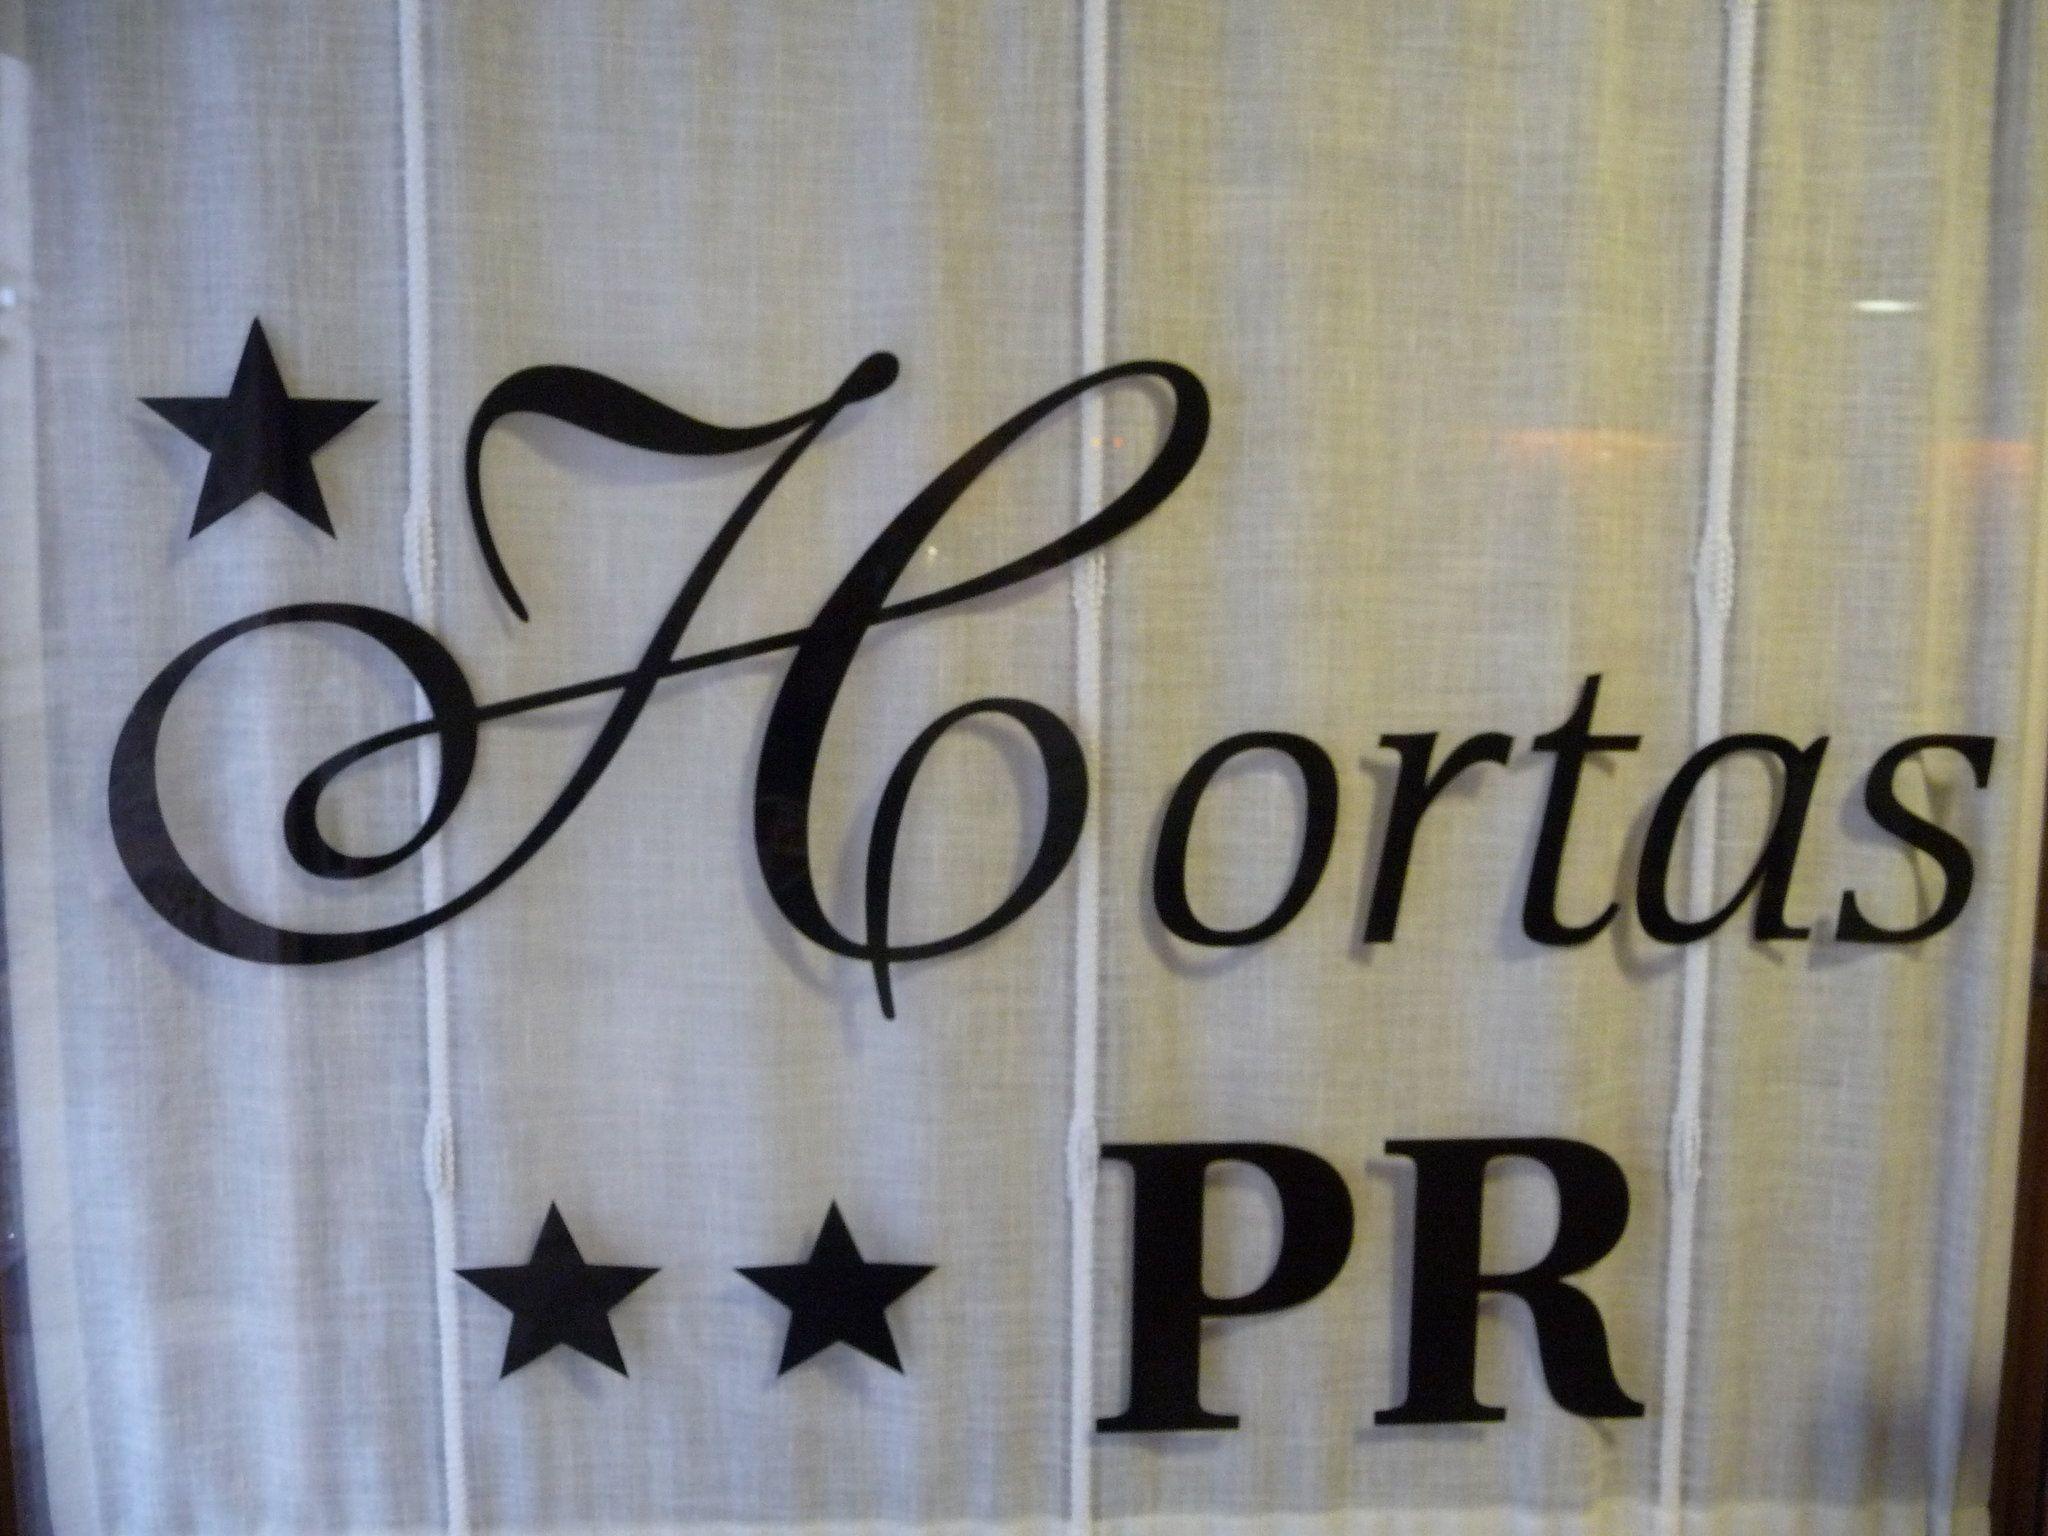 Hortas P.R.